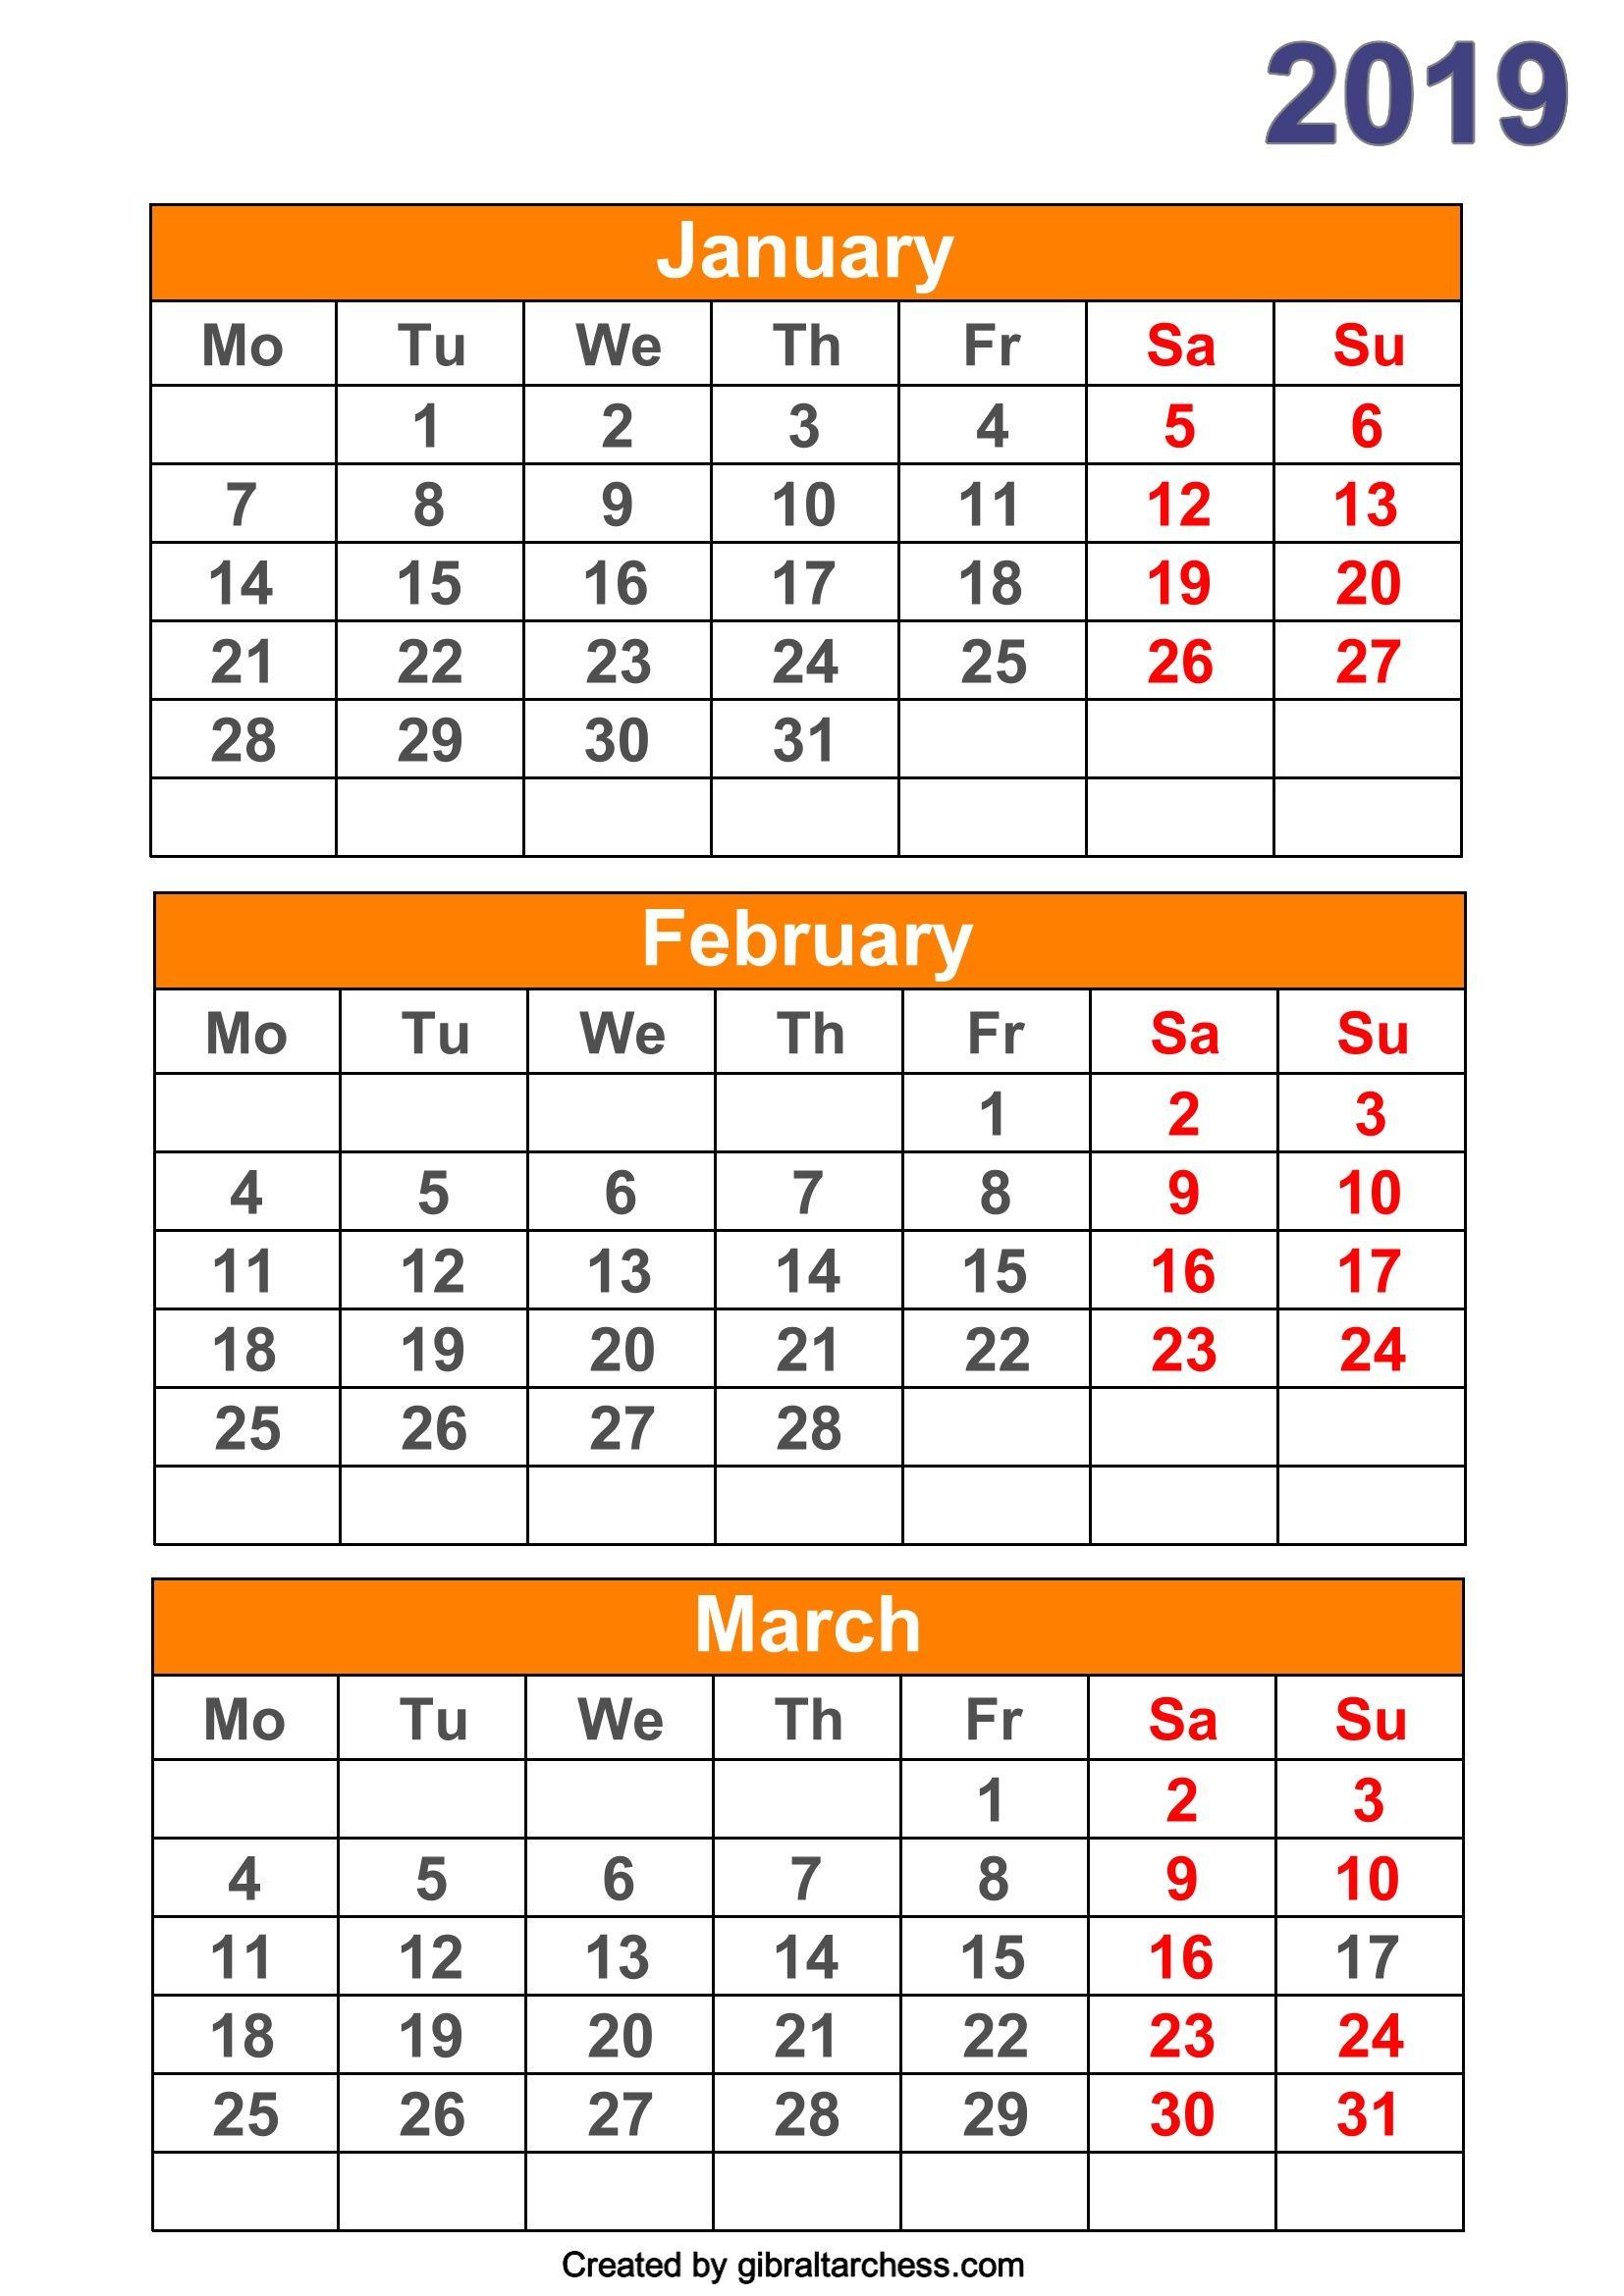 2019 Calendar 4 Months Per Page Printable | 2019 Calendar